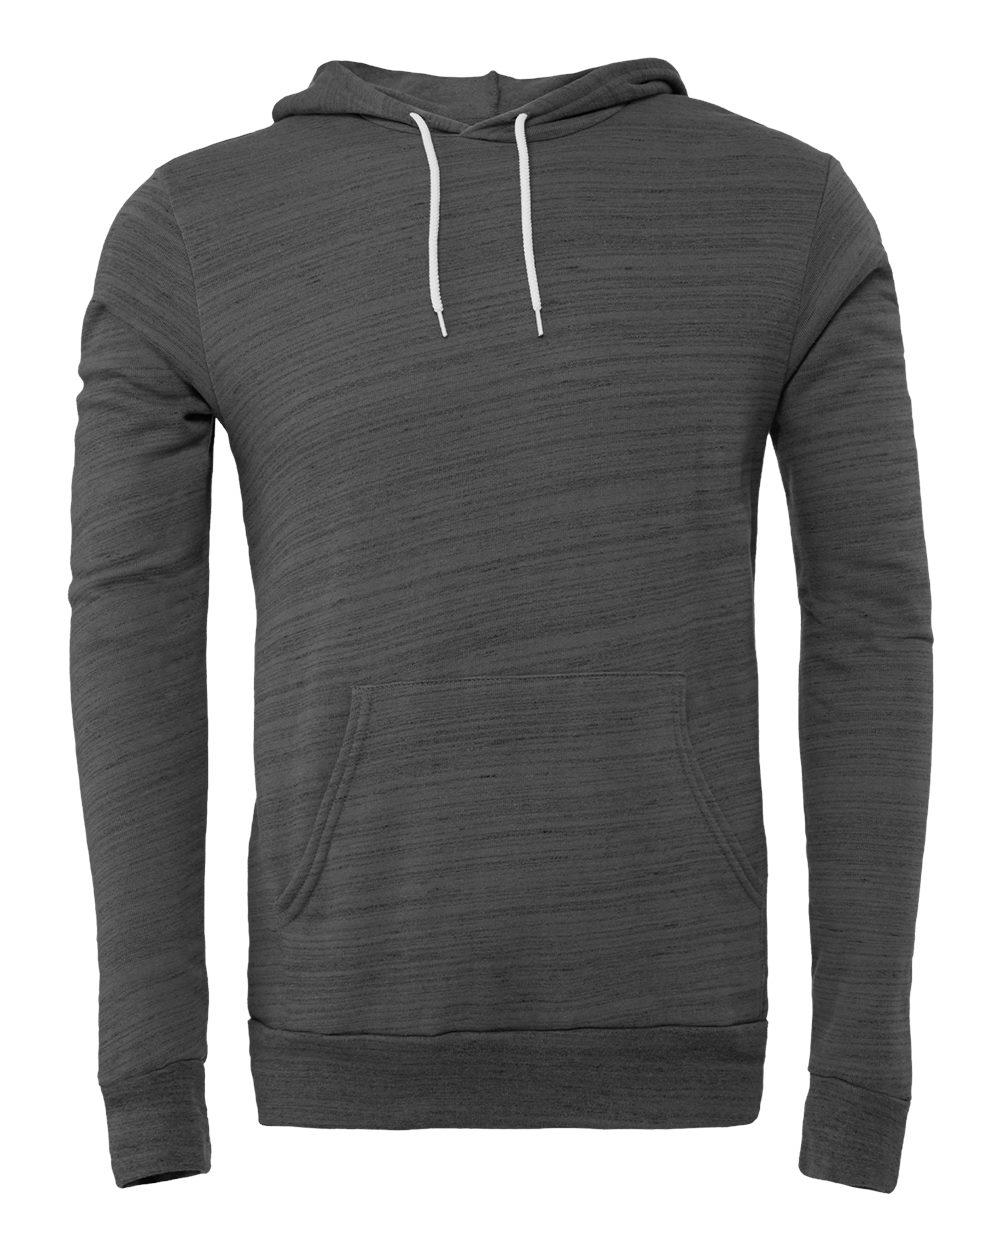 Bella-Canvas-Unisex-Sponge-Hooded-Pullover-Sweatshirt-Blank-3719-up-to-2XL thumbnail 22